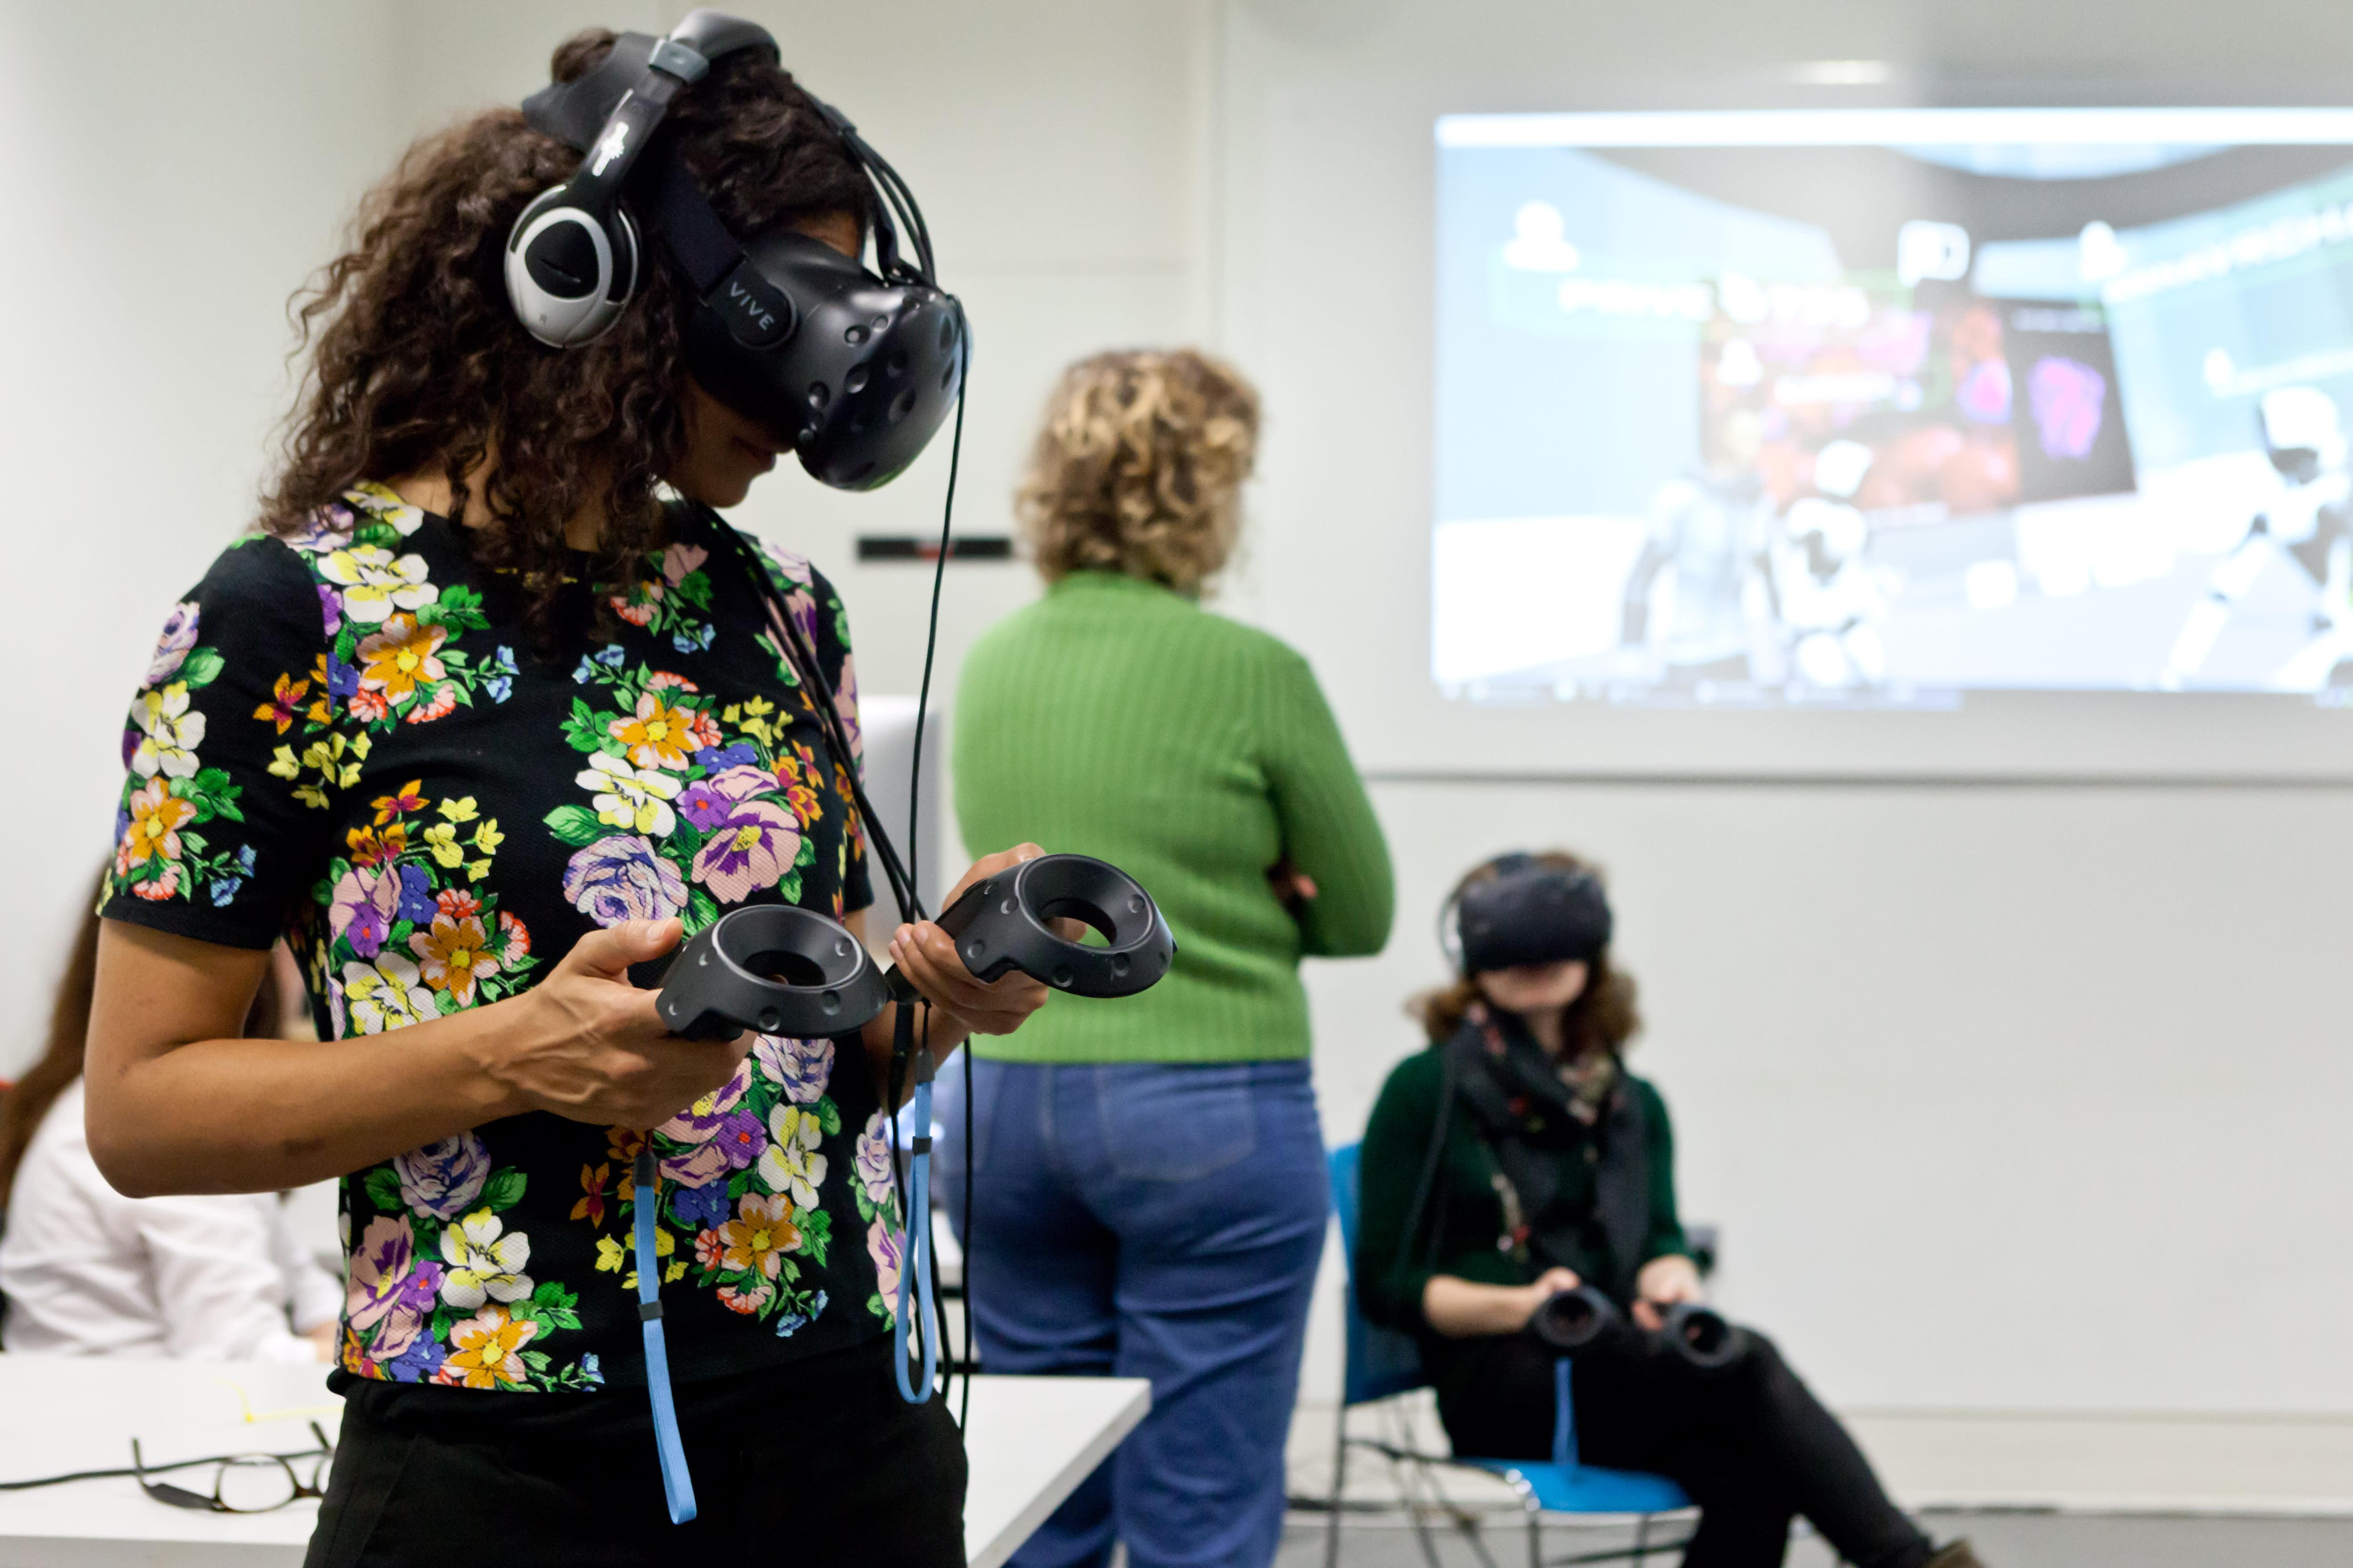 MA-ACE-Virtual-Reality-Conference-52.jpg